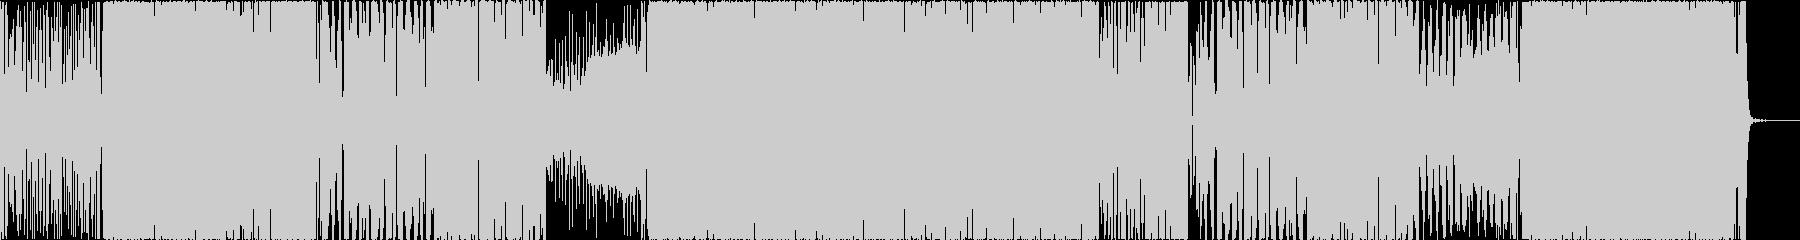 EDM フォートナイト風 バトル 戦闘の未再生の波形